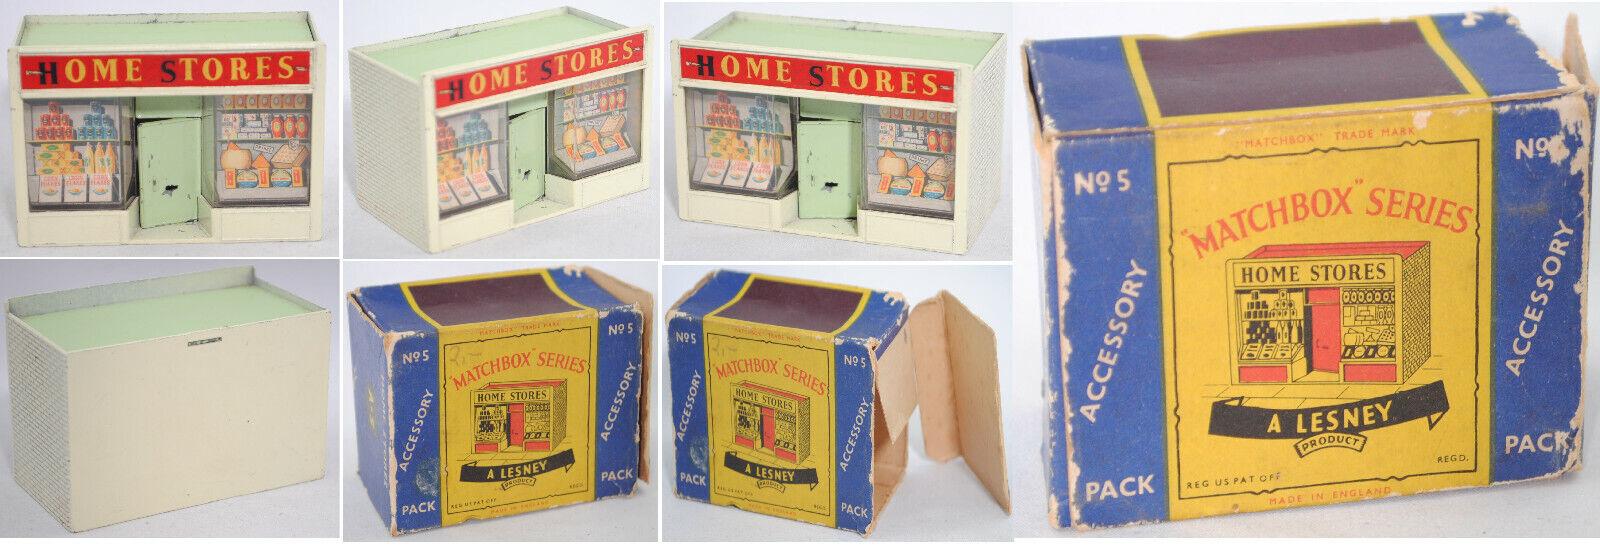 Matchbox A-5 Home Stores, Pale-Green Beige White Green, 57 Heinz 57 Cubes OXO Cubes